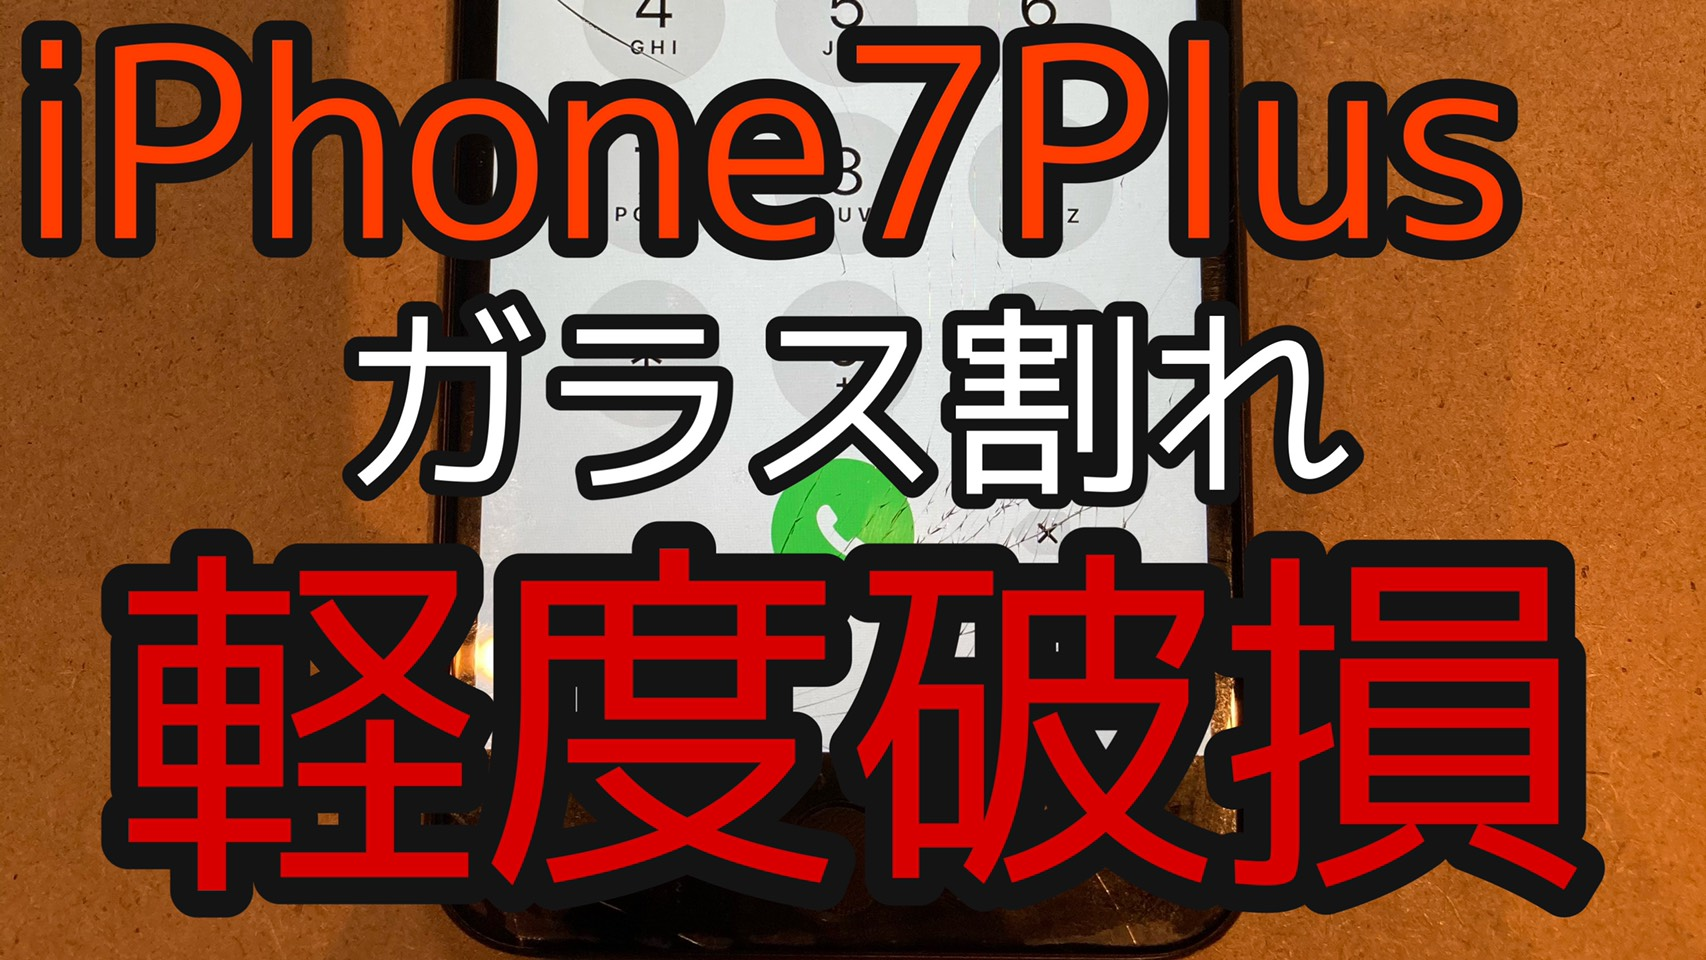 iPhone7Plusアイキャッチ画像